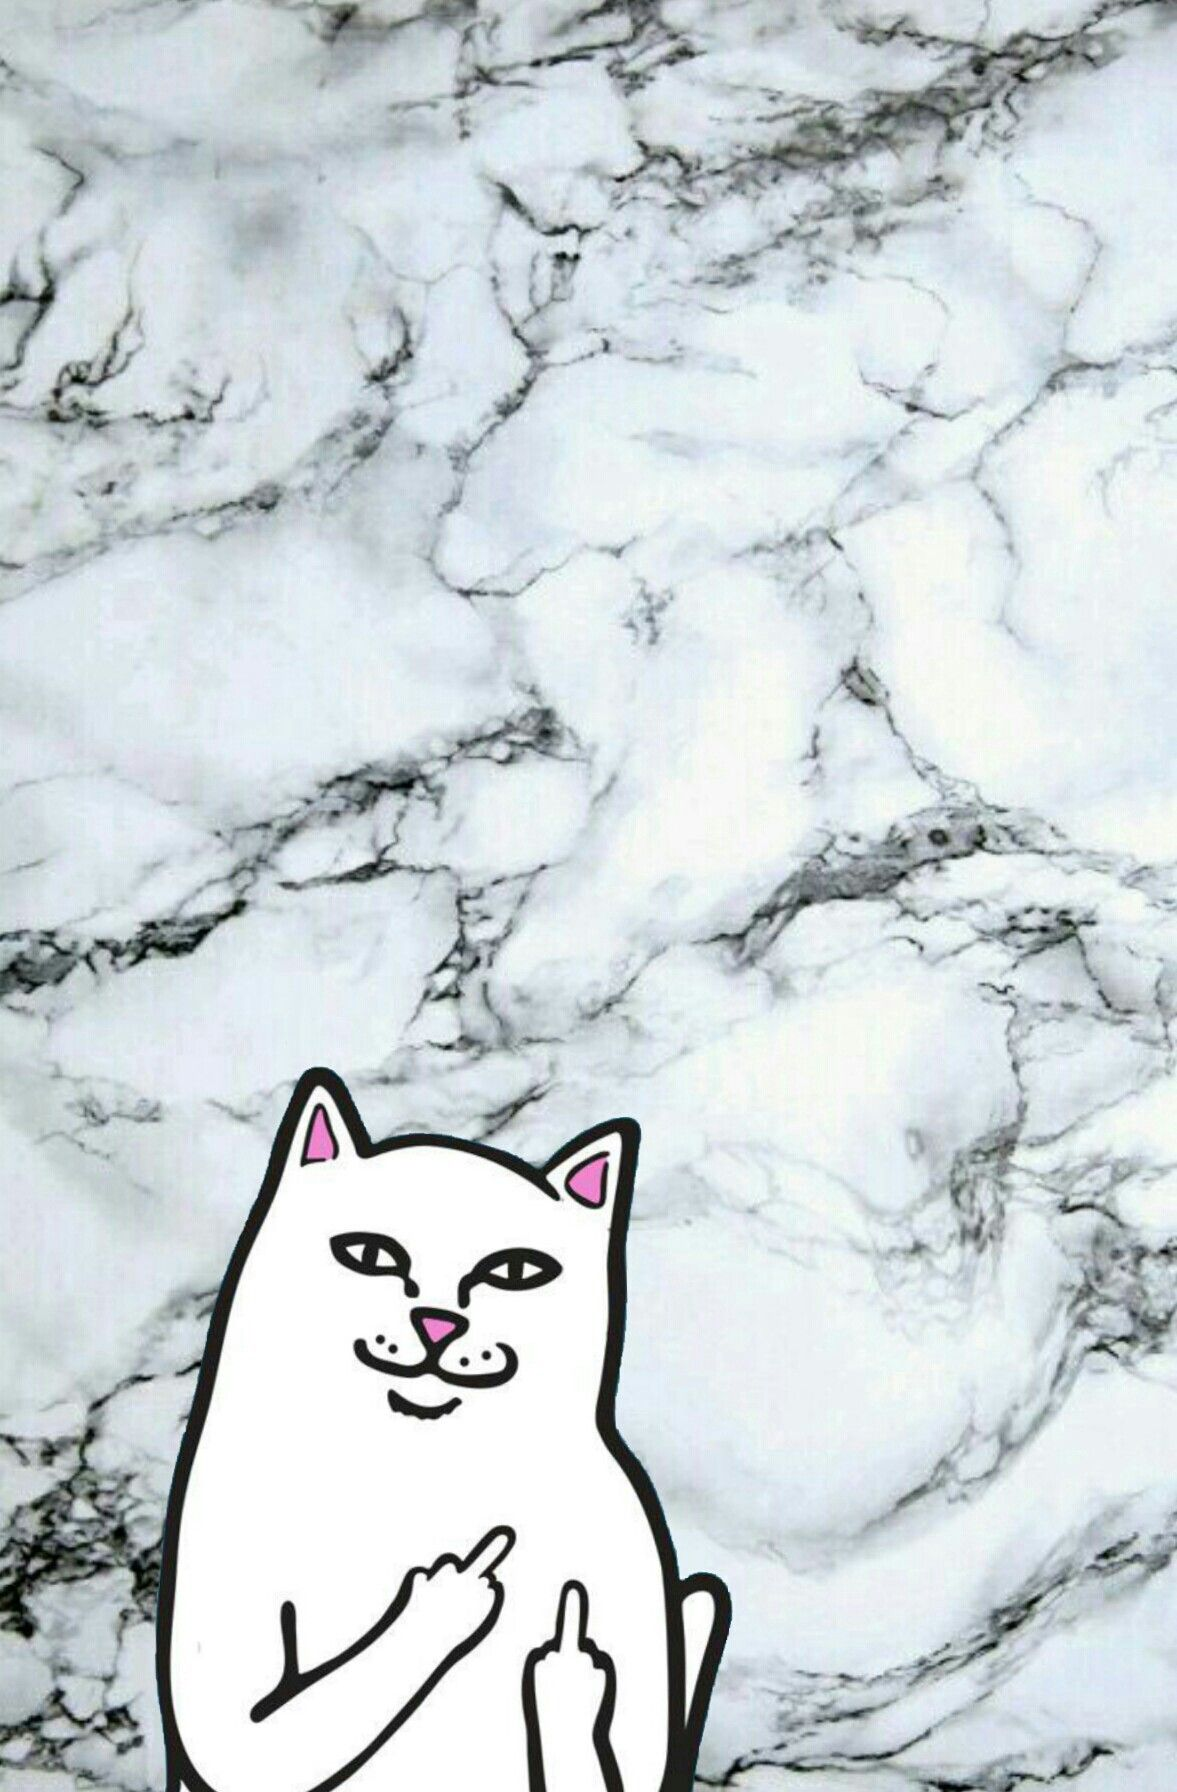 Ripndip iphone wallpaper #ripndip #middle #finger #cat # ...